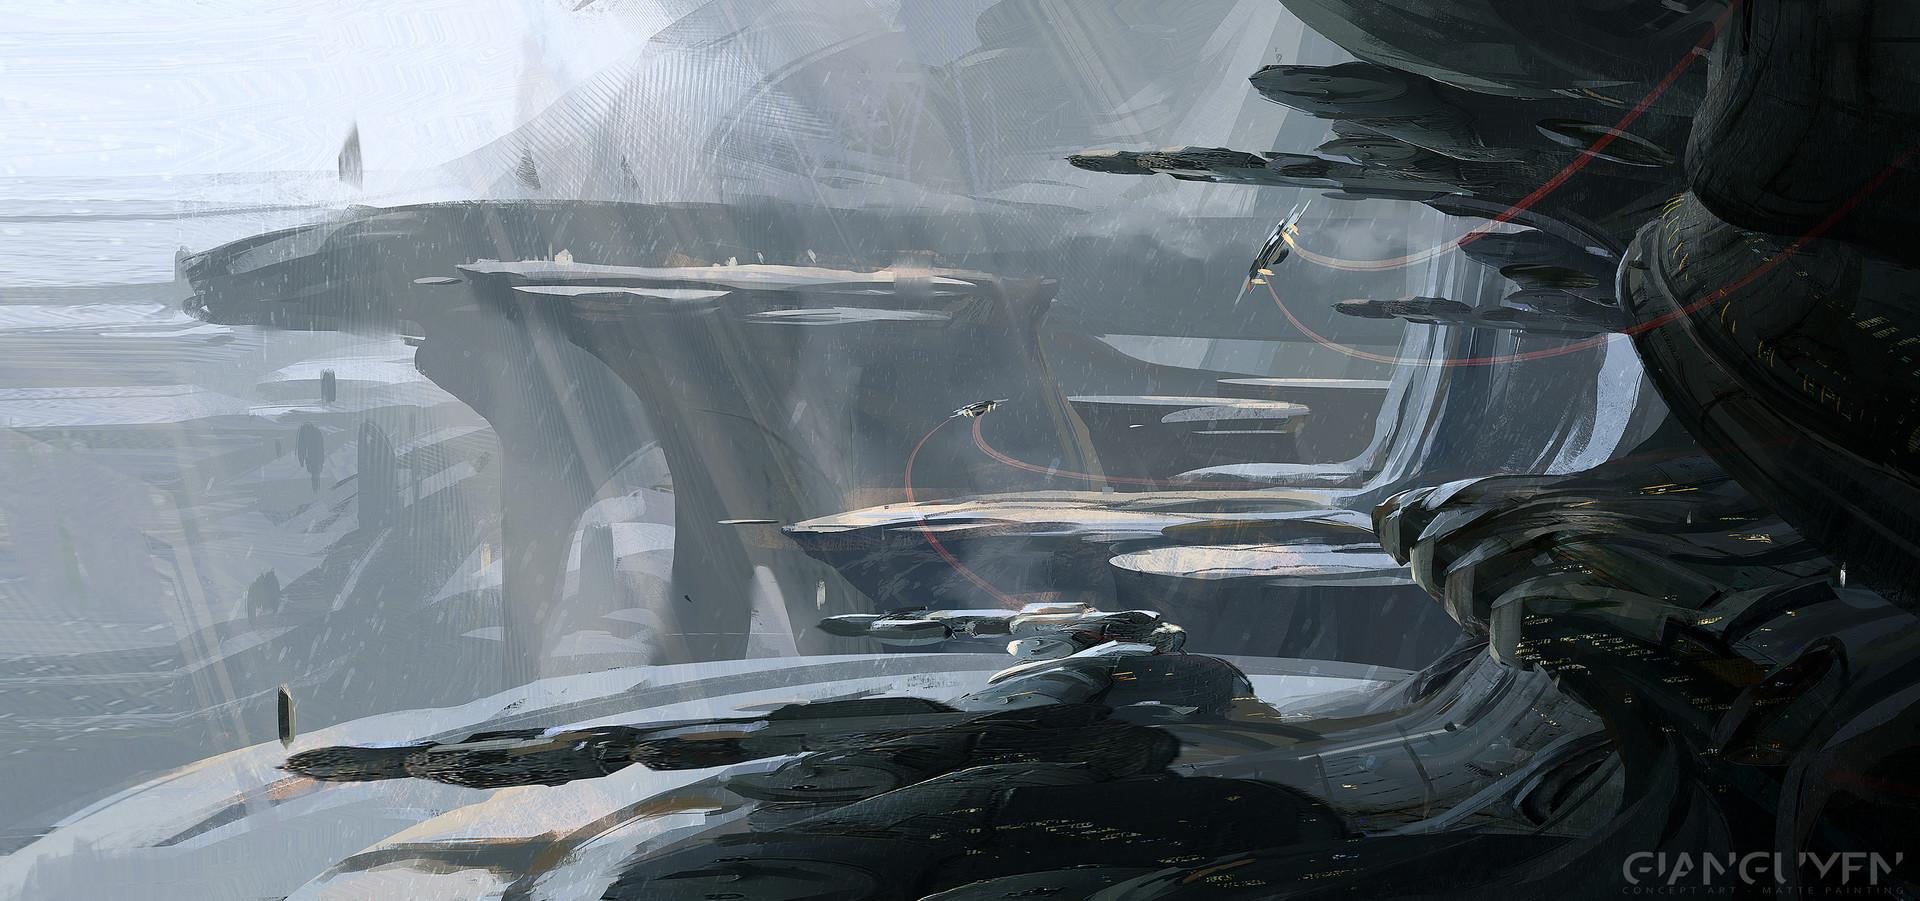 Gia nguyen sketch3 as2